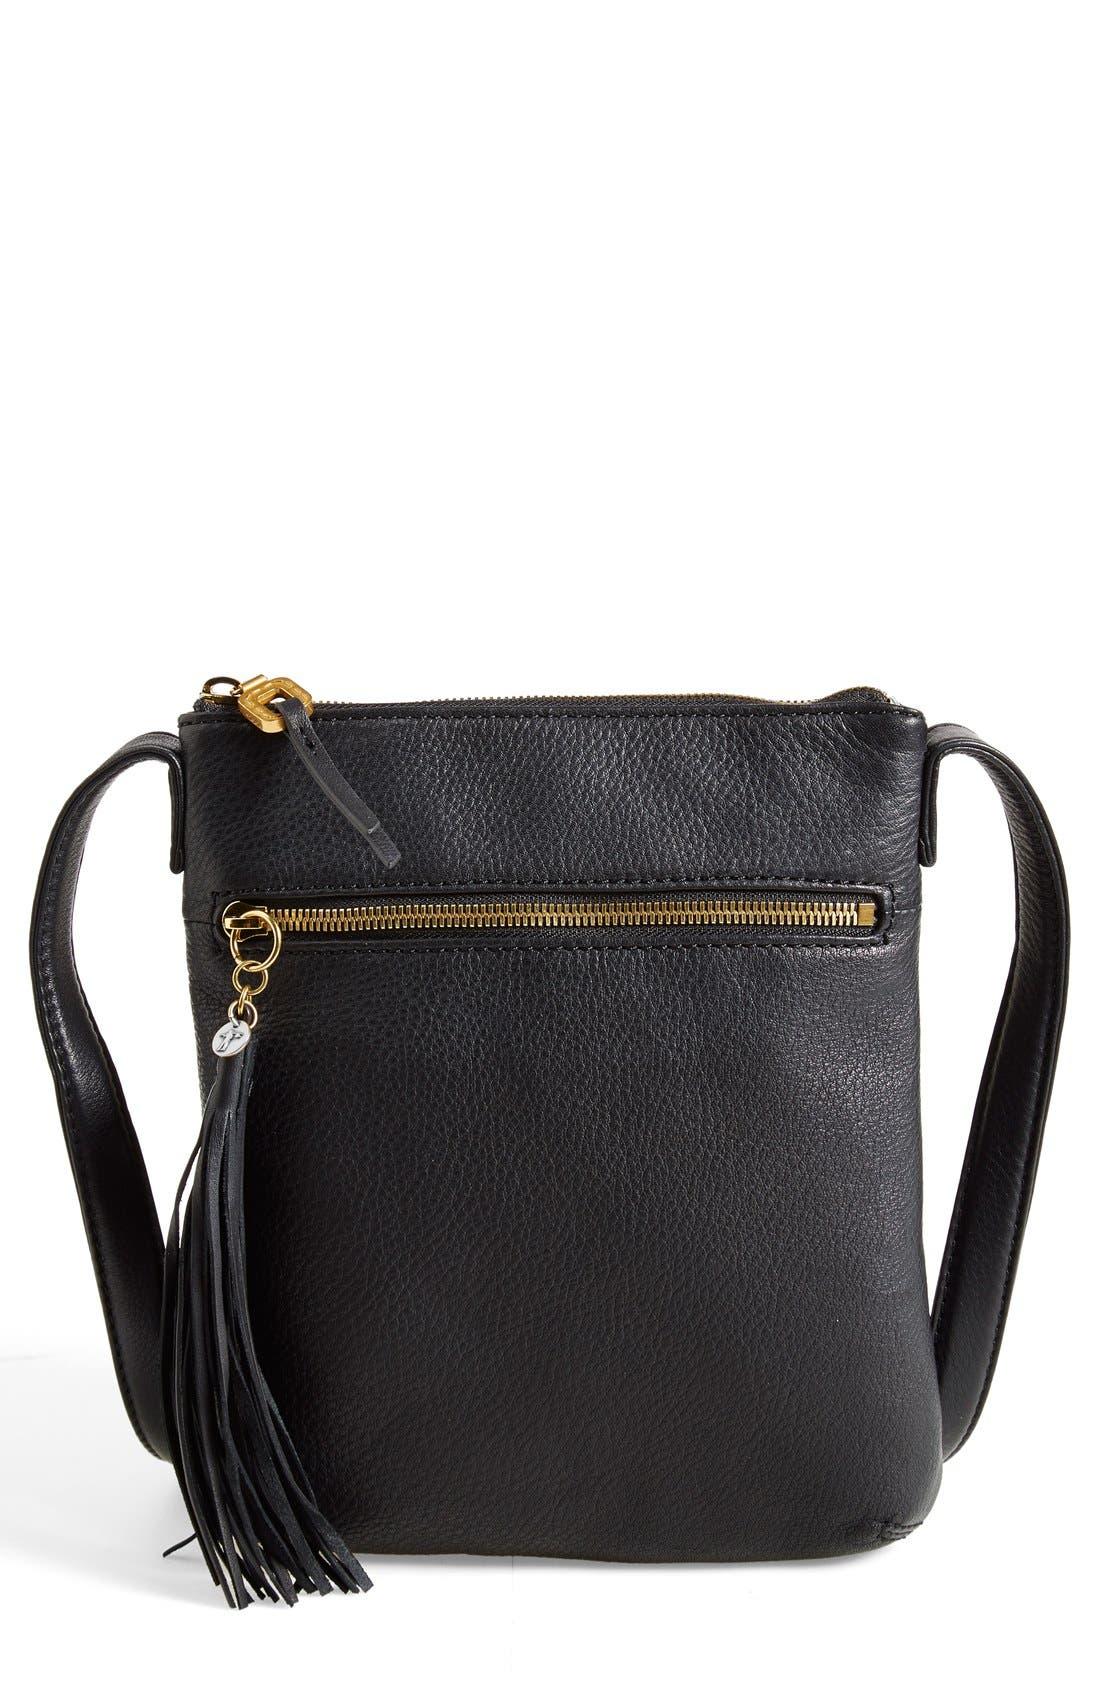 'Sarah' Leather Crossbody Bag,                         Main,                         color,